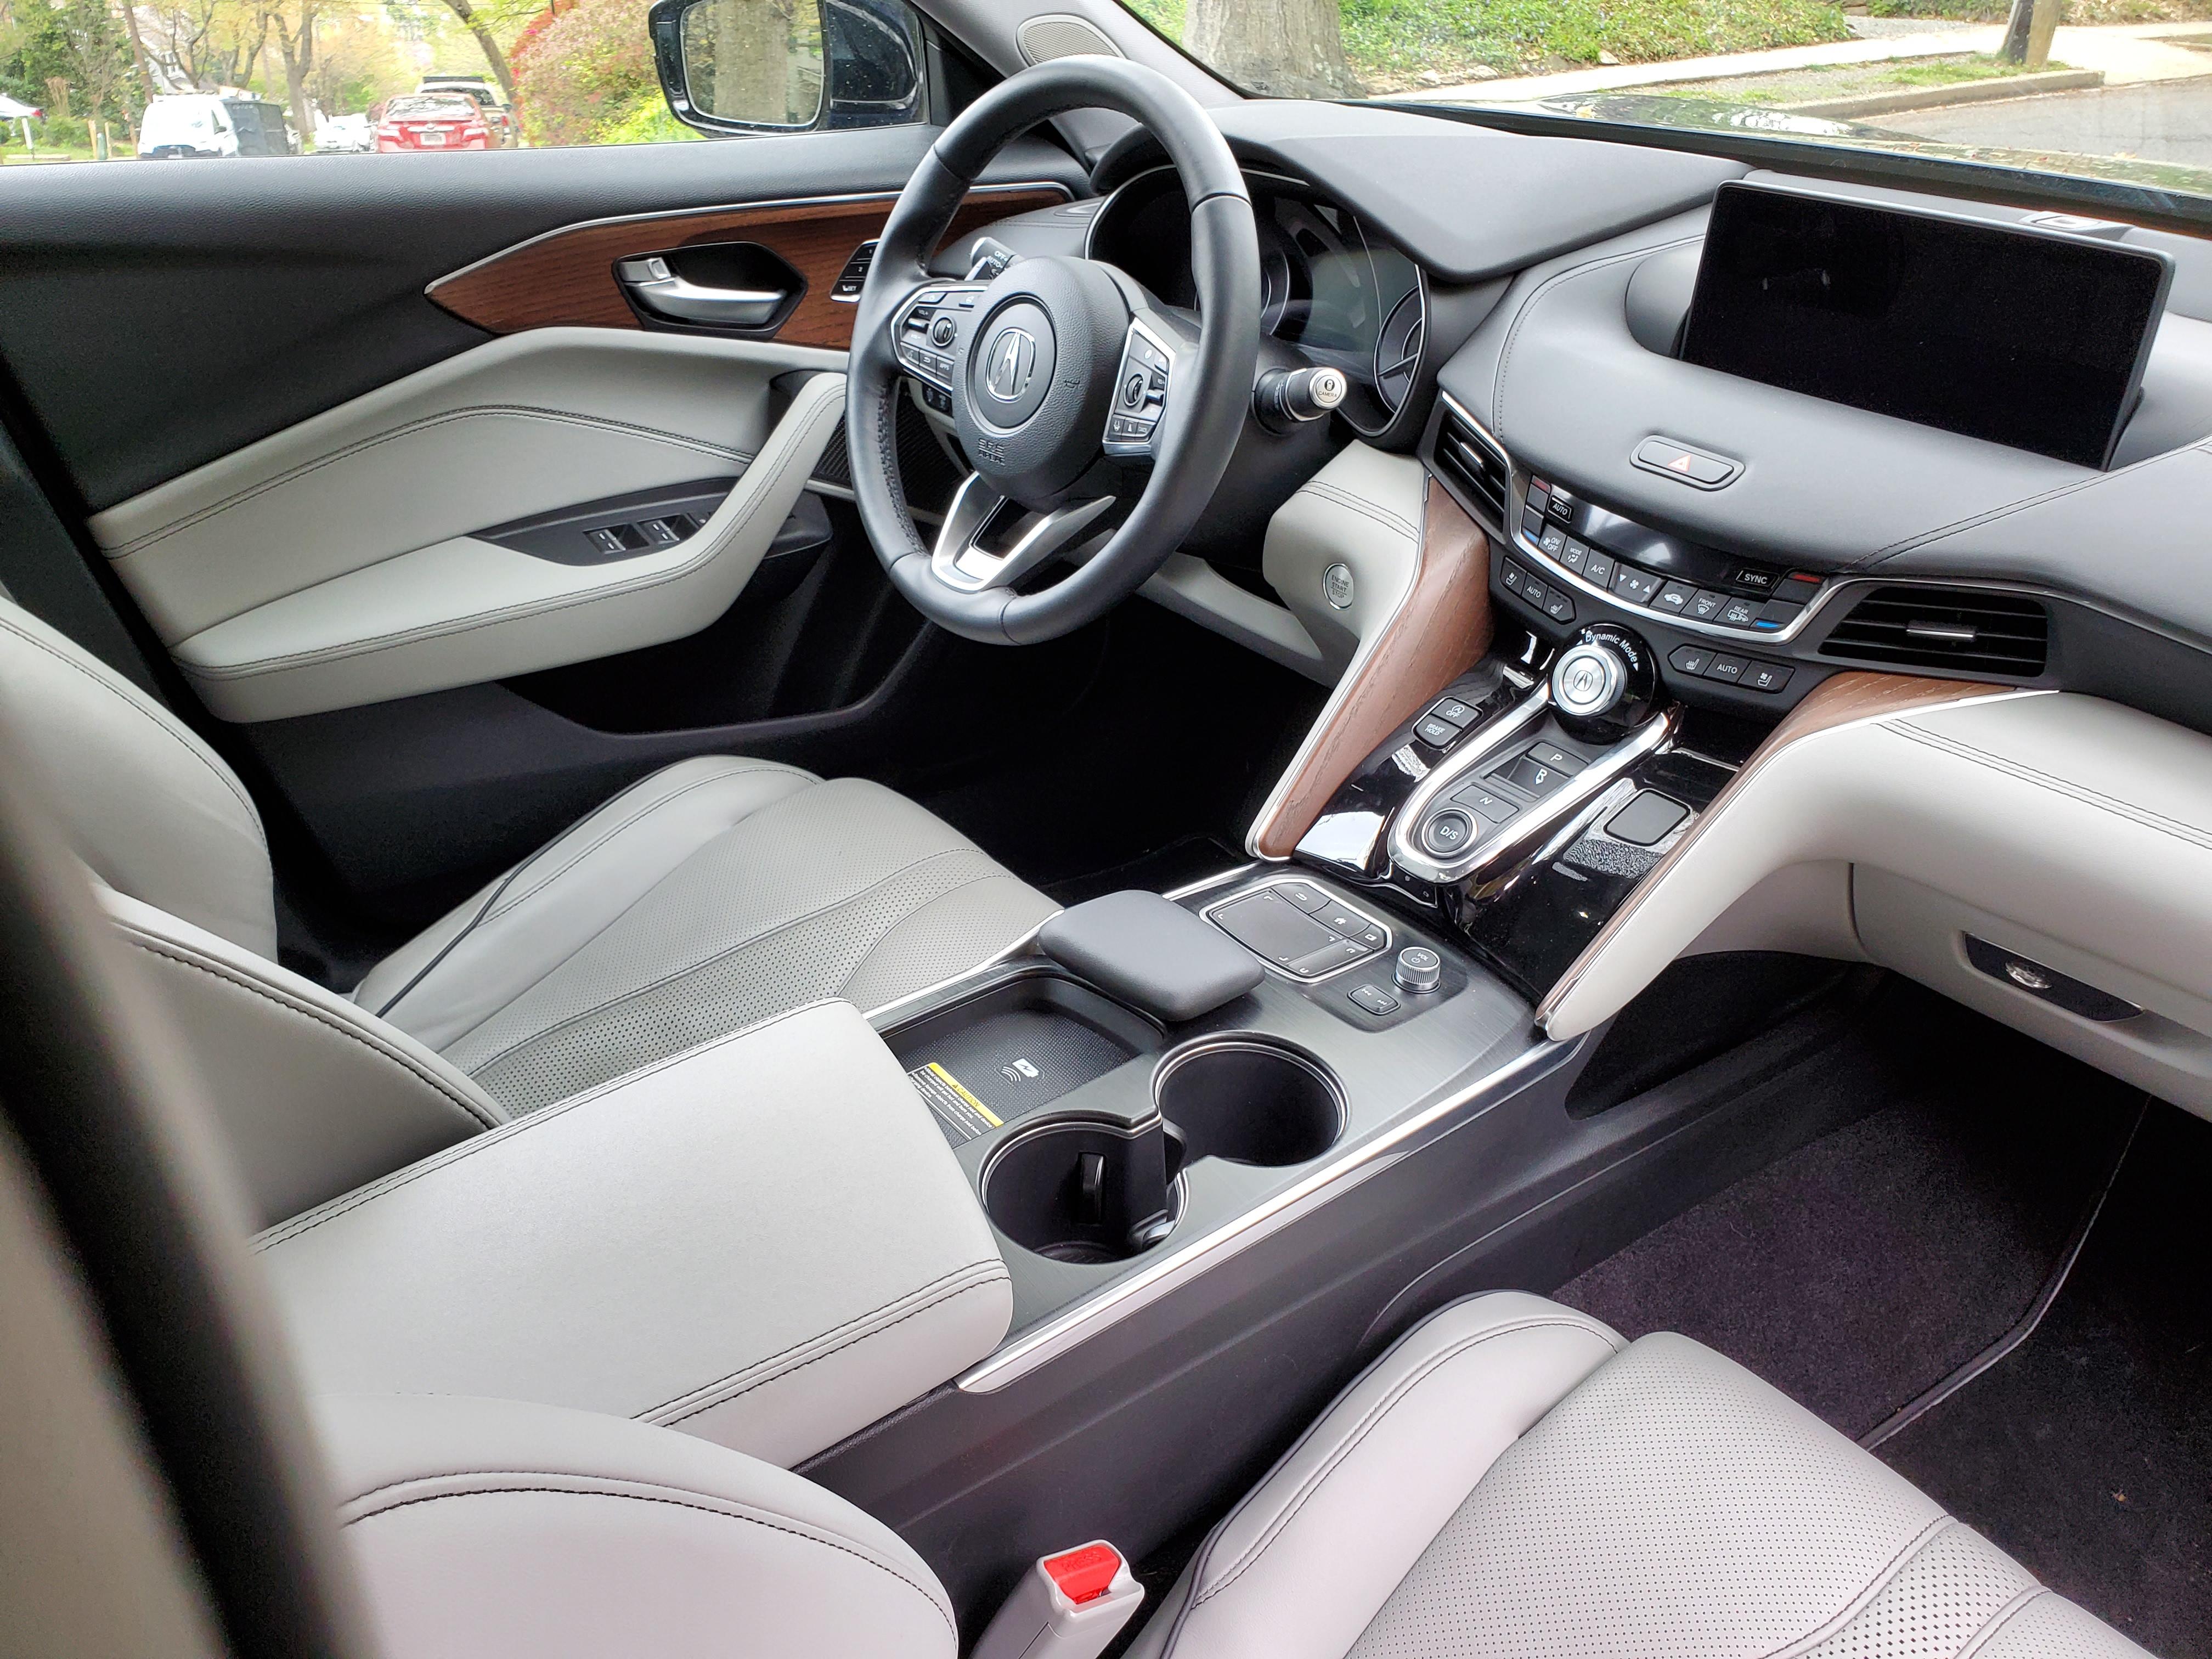 2021 Acura TLX Interior Right Side